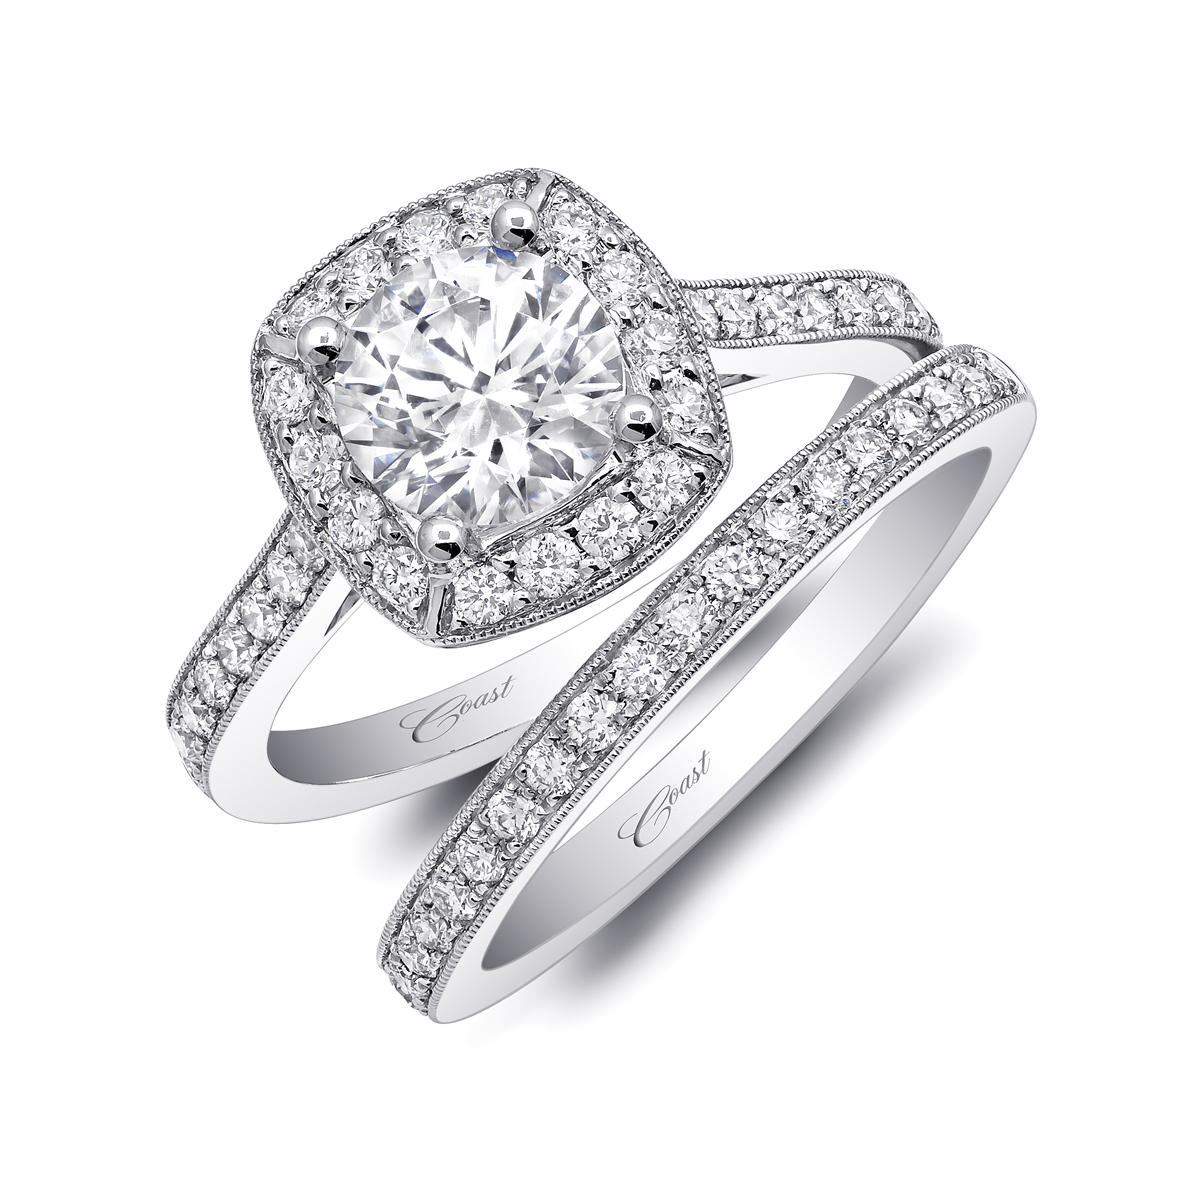 Romance Engagement Ring - Pave Diamond Halo